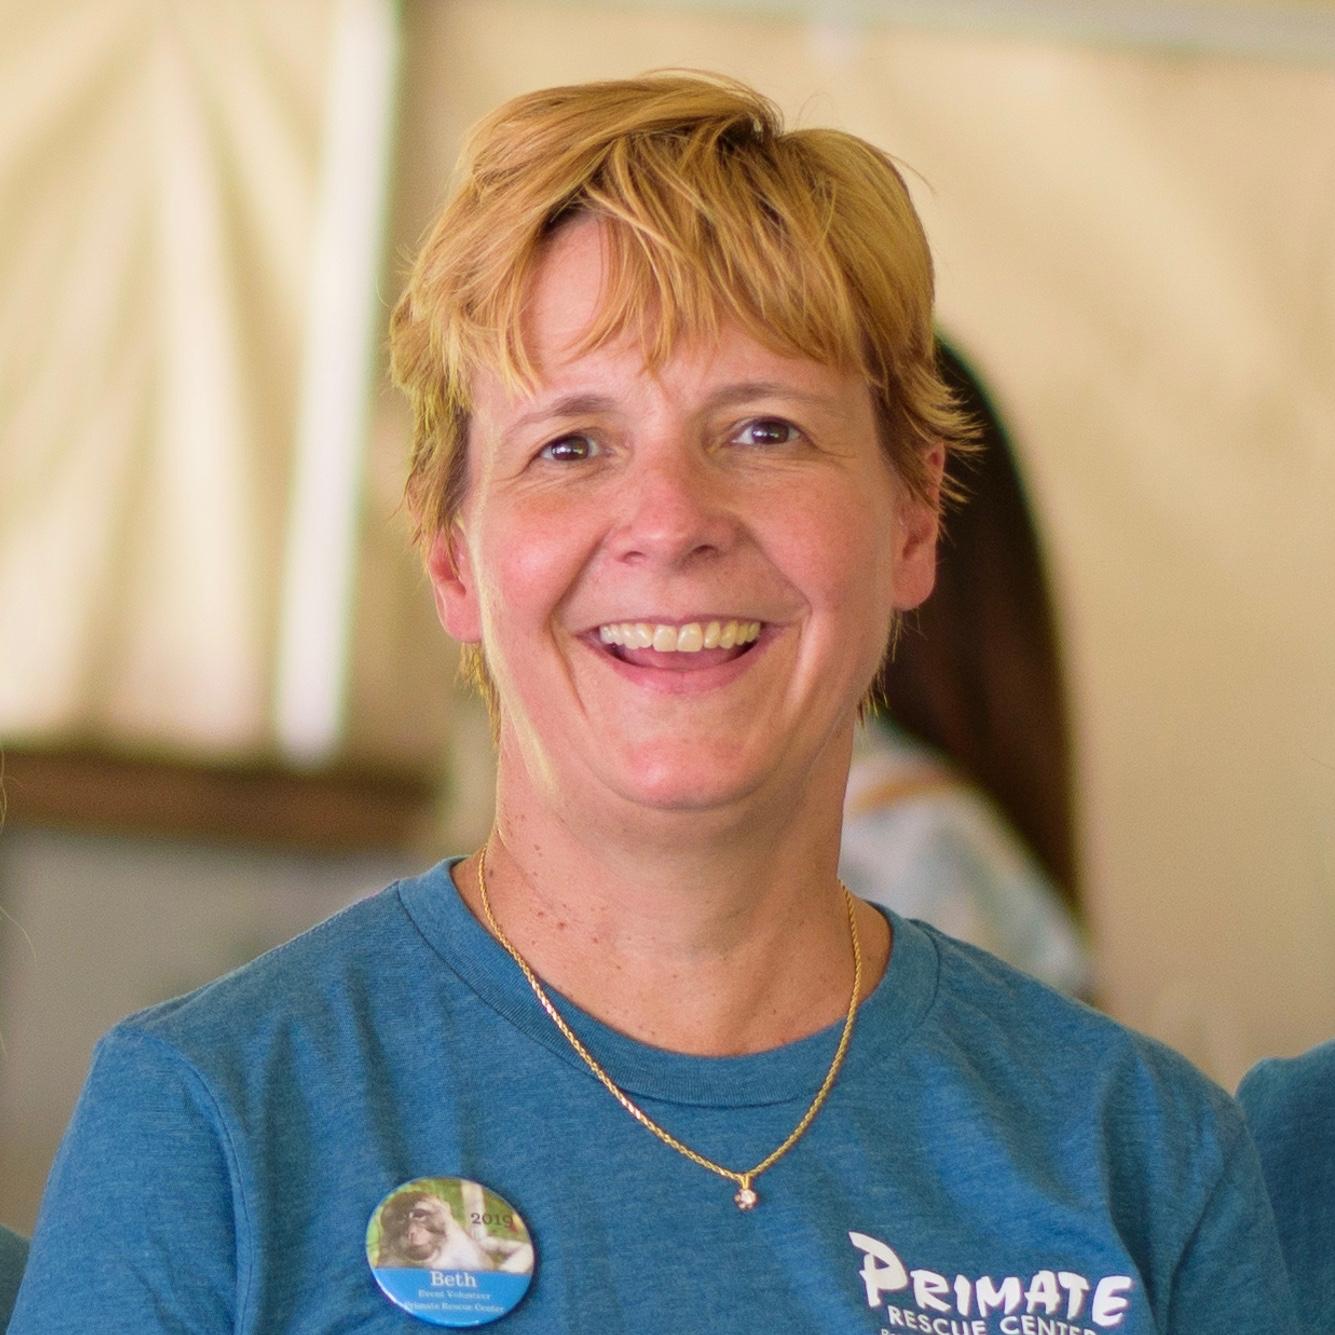 Beth Goldenberg